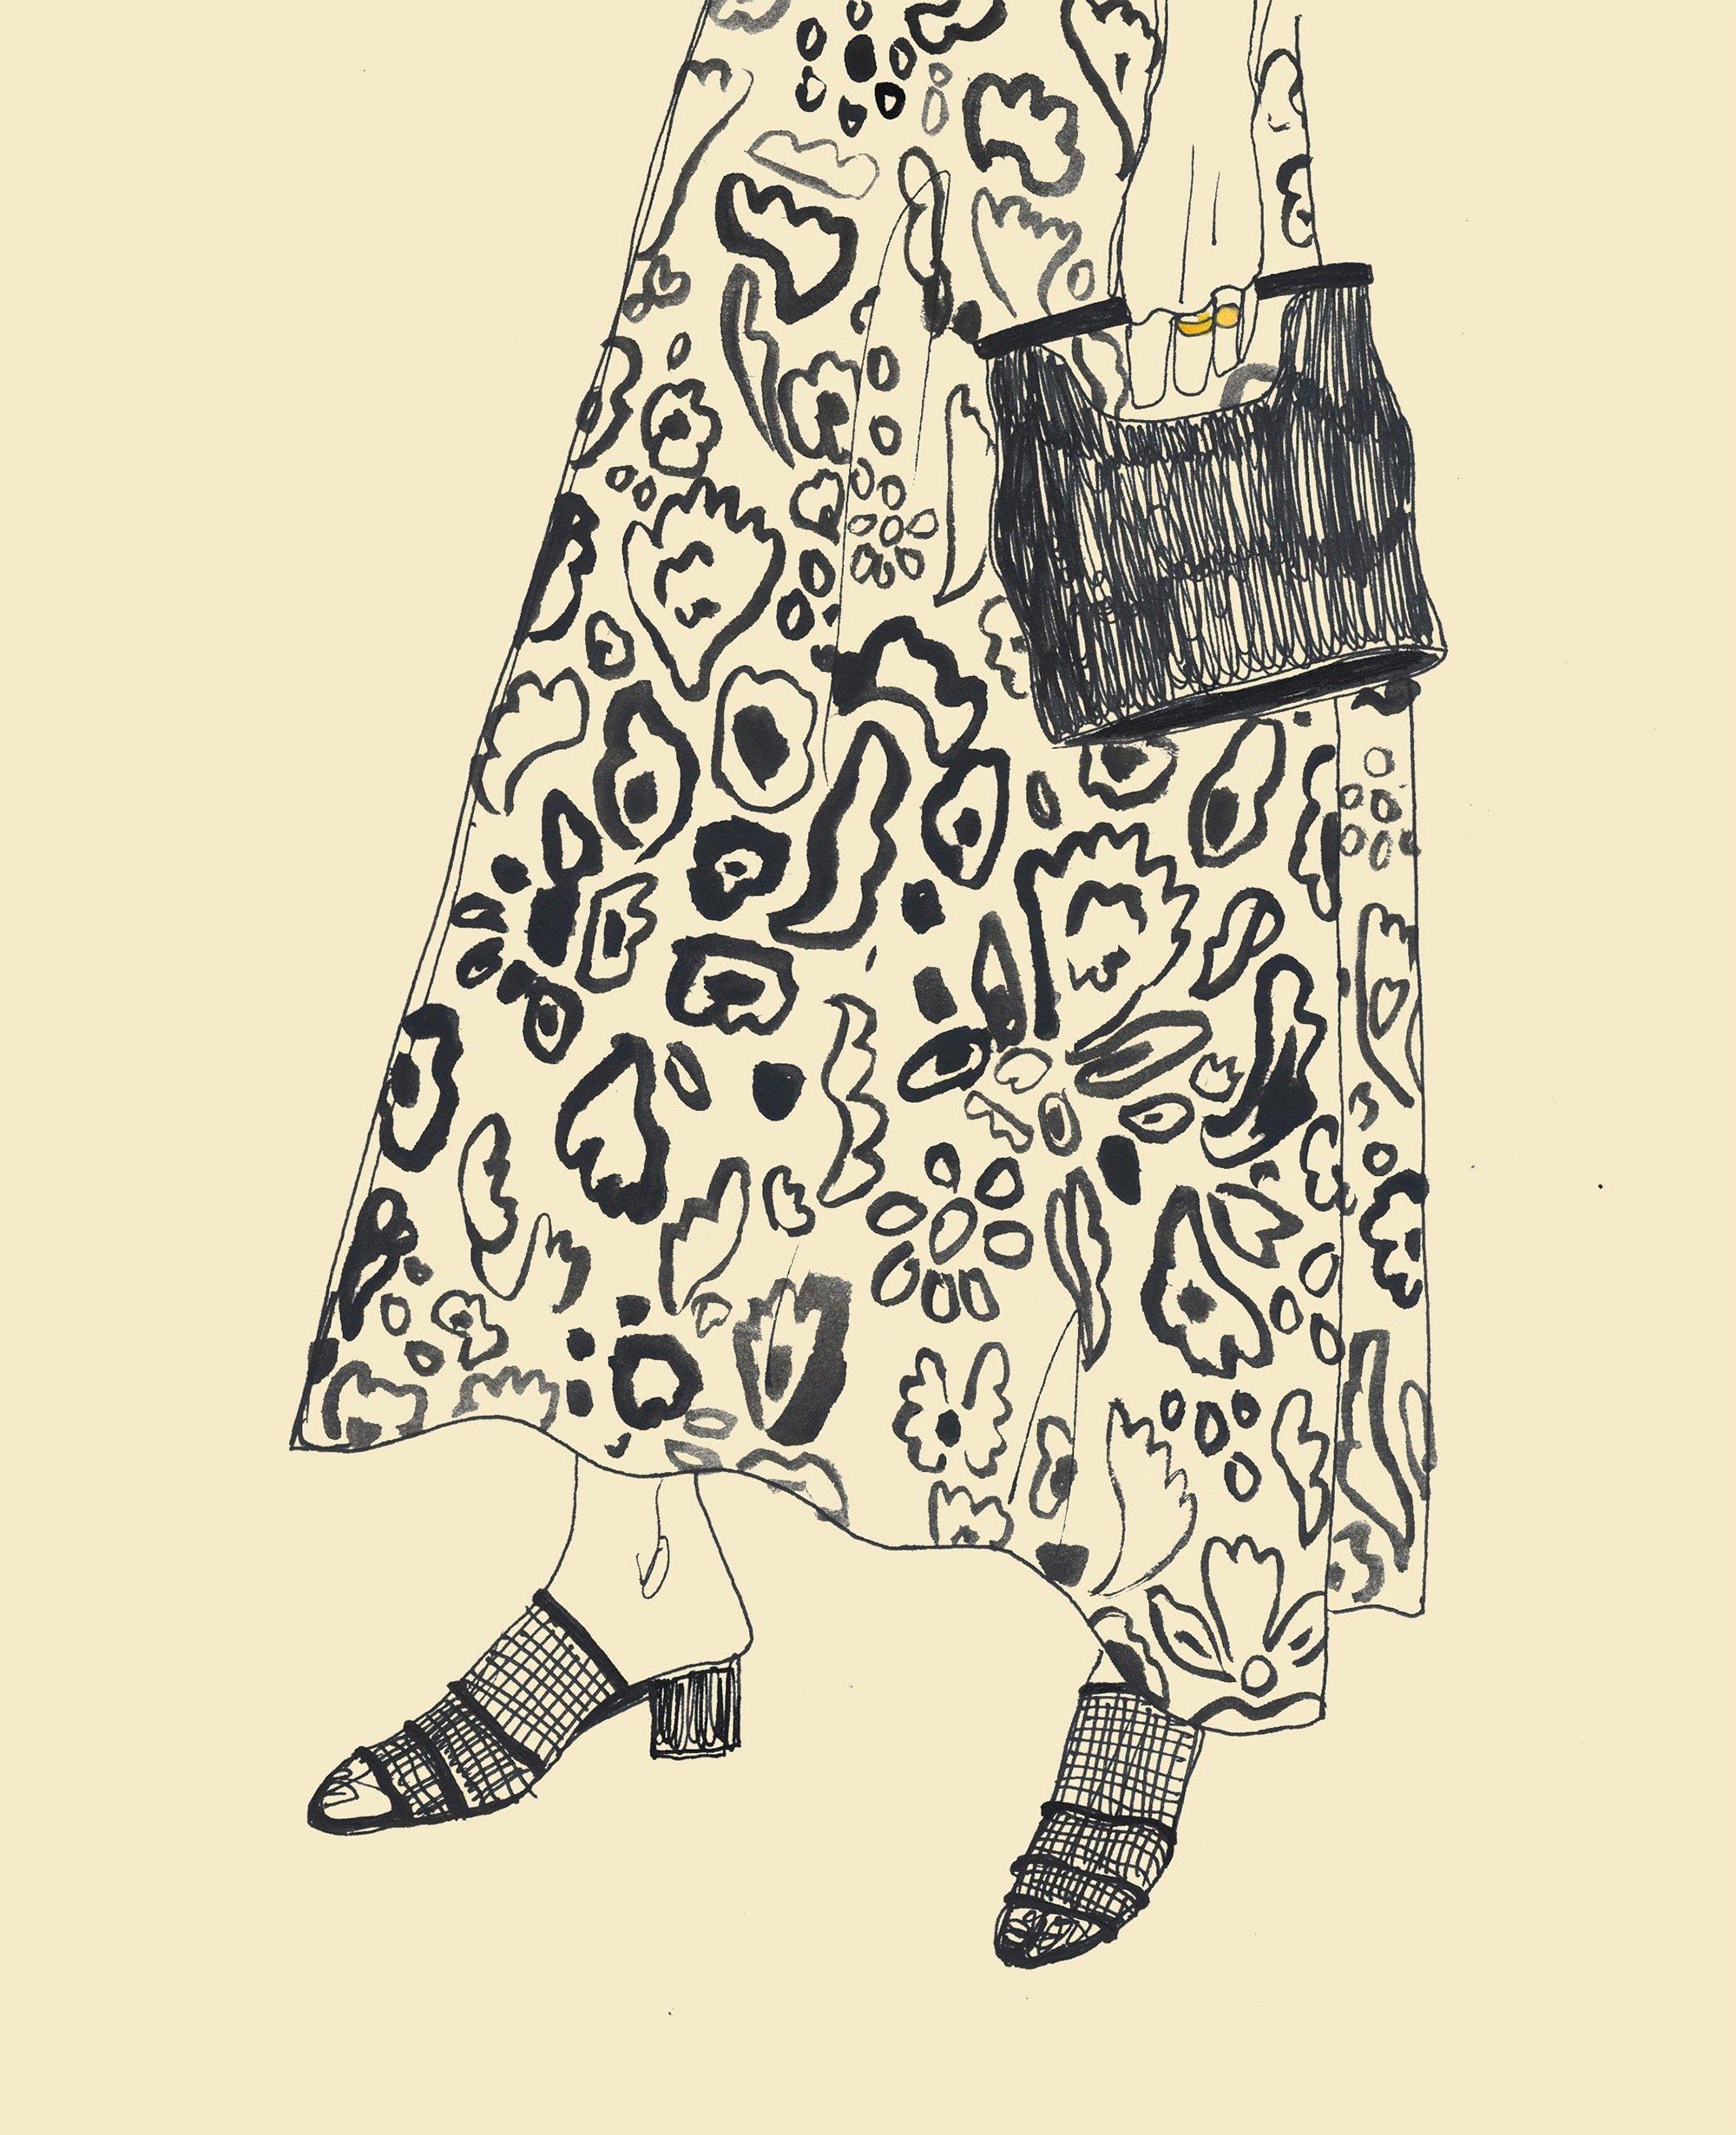 IGNANT-Art-Rosie-McGuinness-26